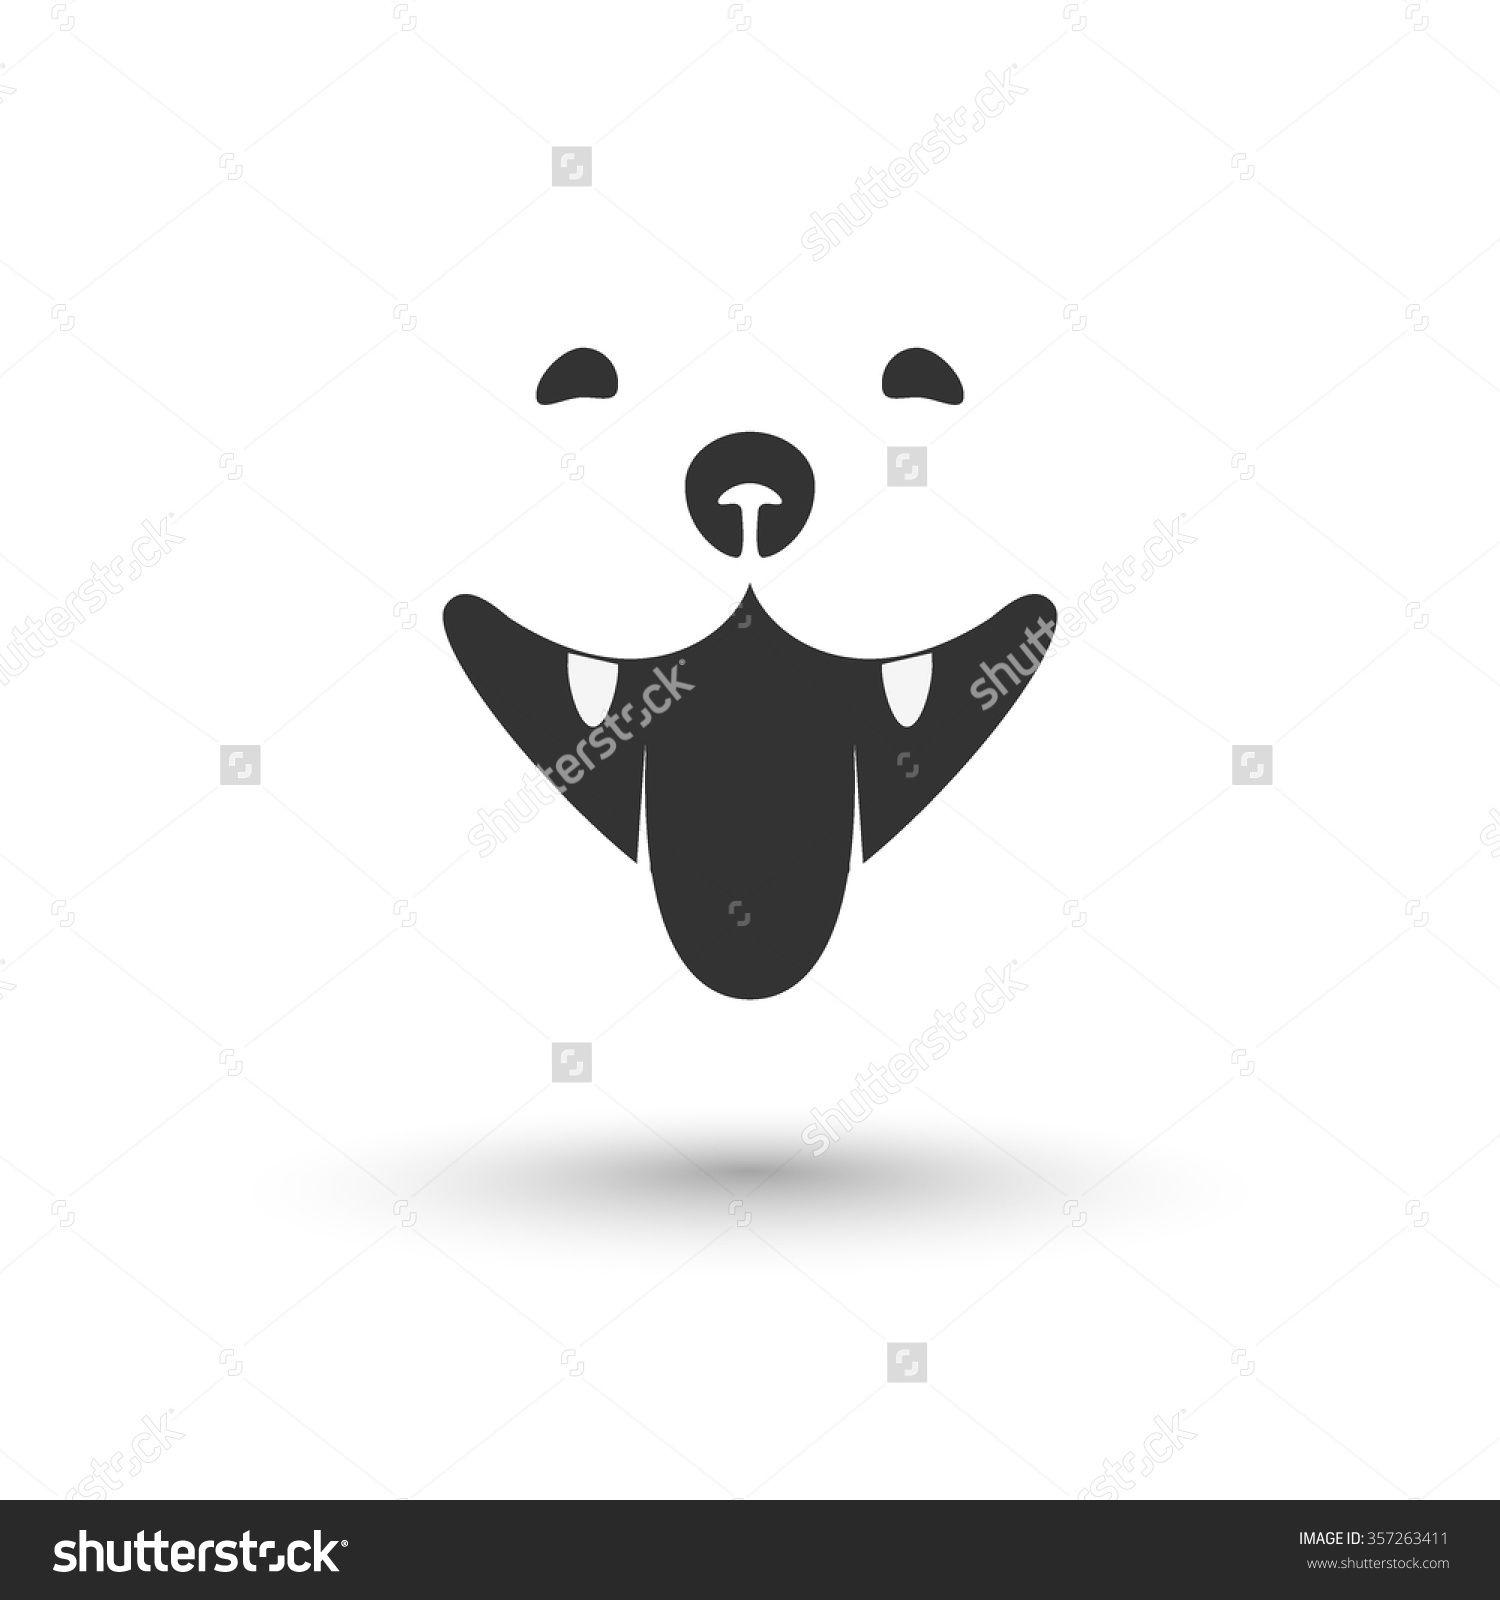 Dog head icon in vector. Vector element for label, logo or emblem design.